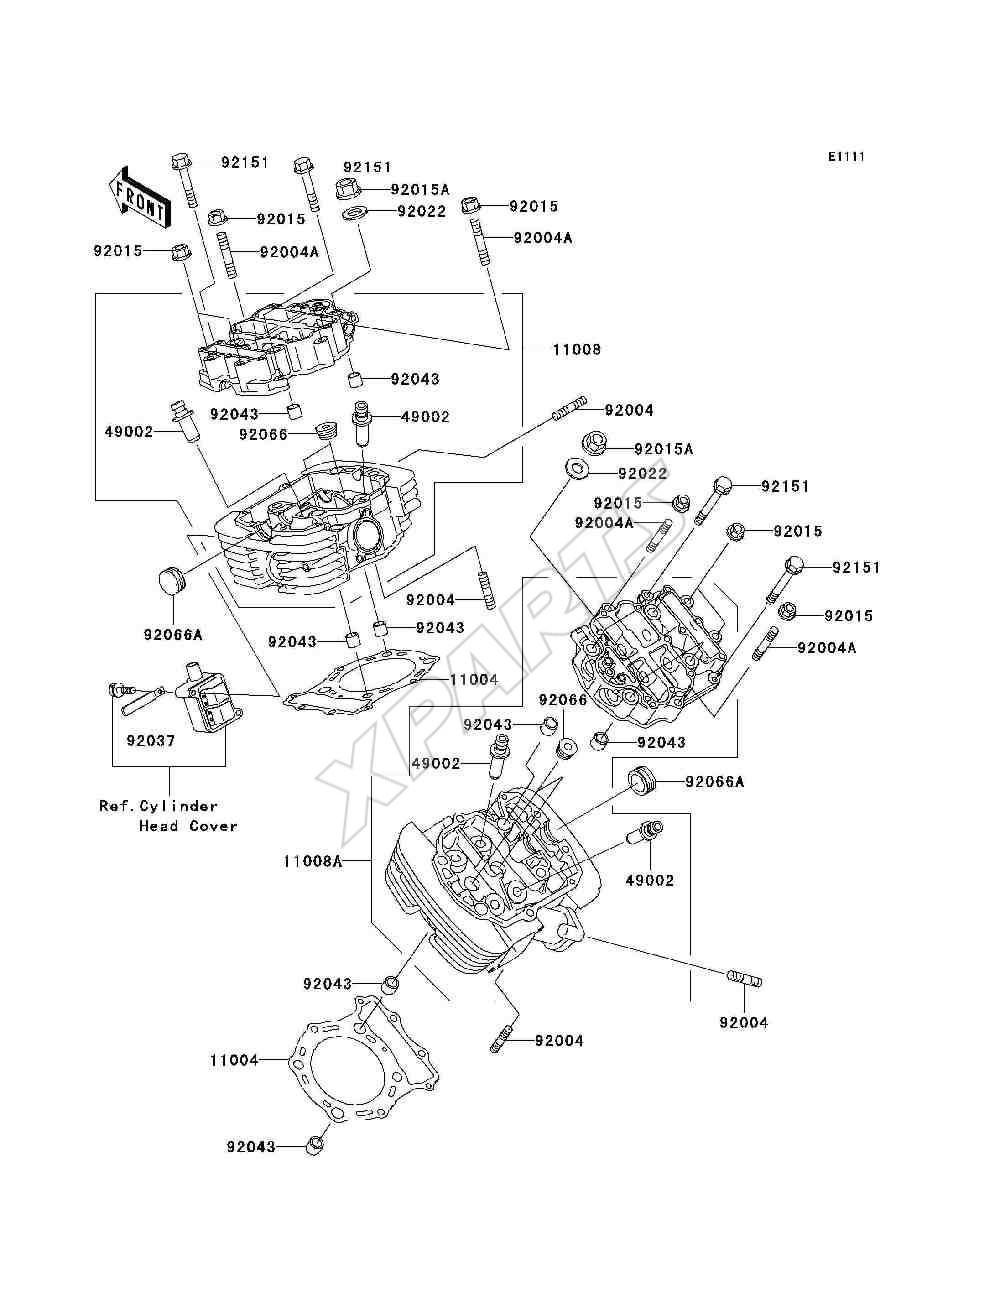 2001 Kawasaki Vn1500 Wiring Diagram 2001 Kawasaki ZRX1200